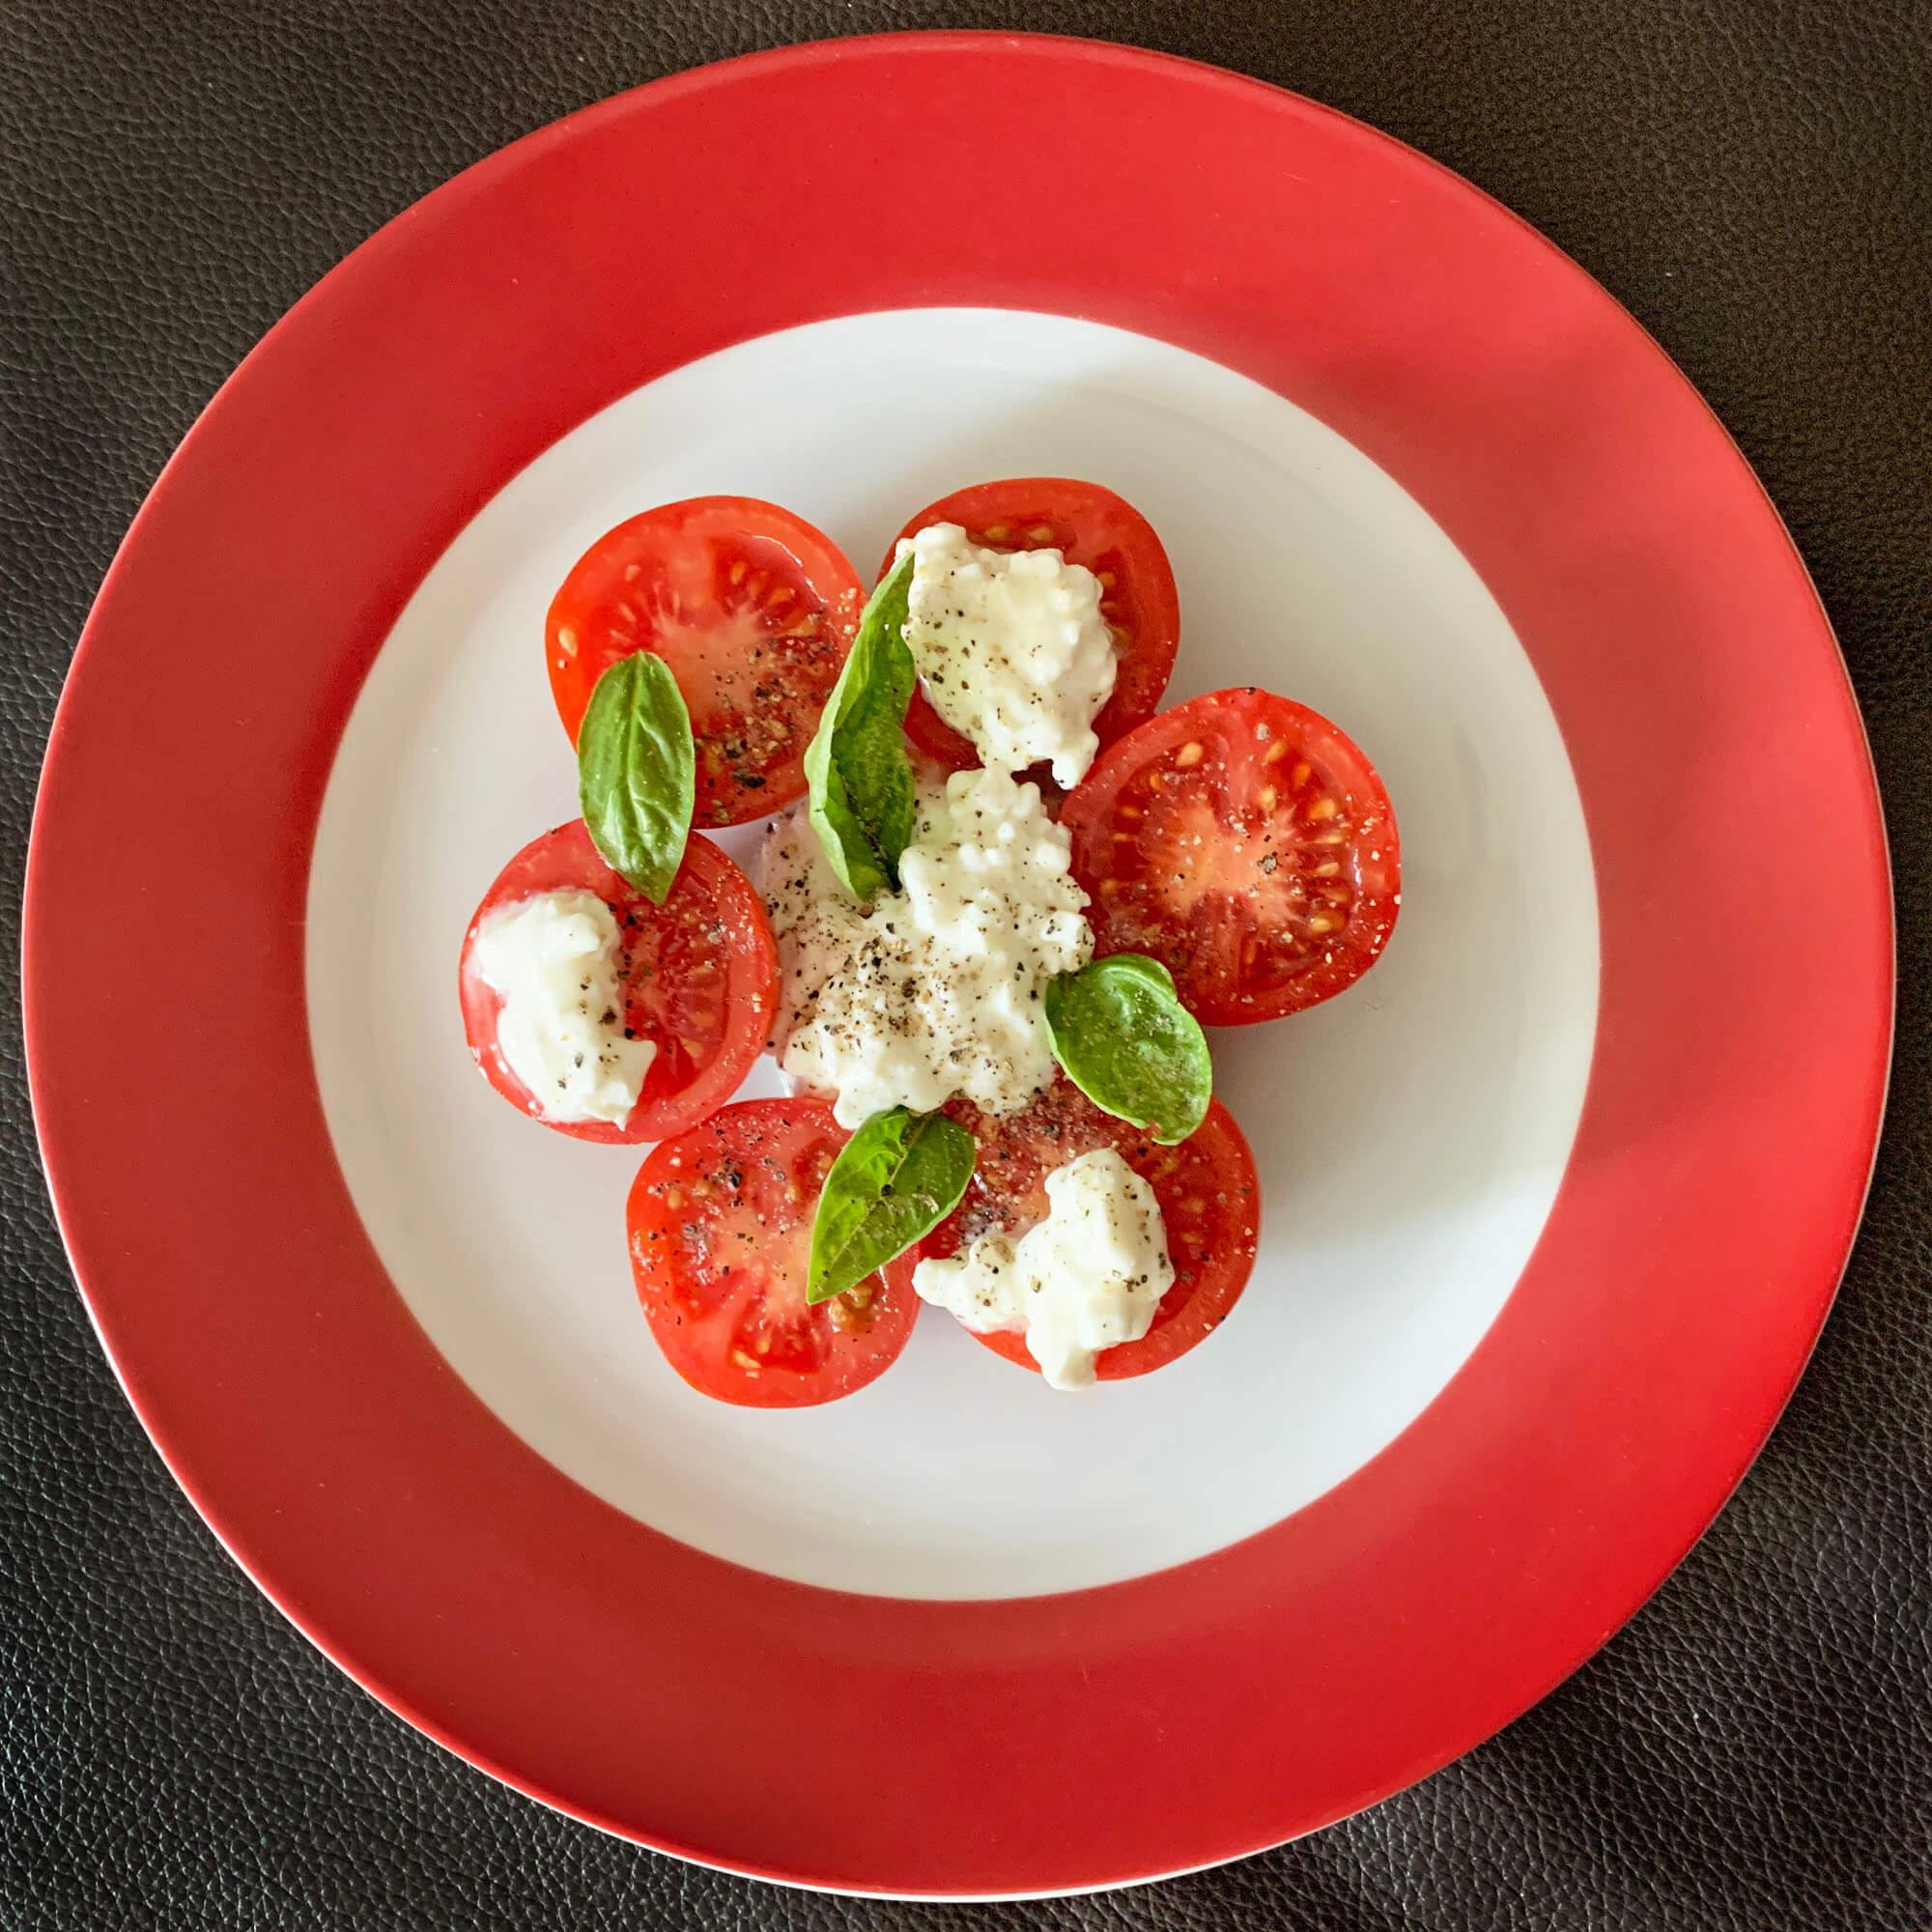 32_Tomate-Frischkäse-Basilikum (anonym)